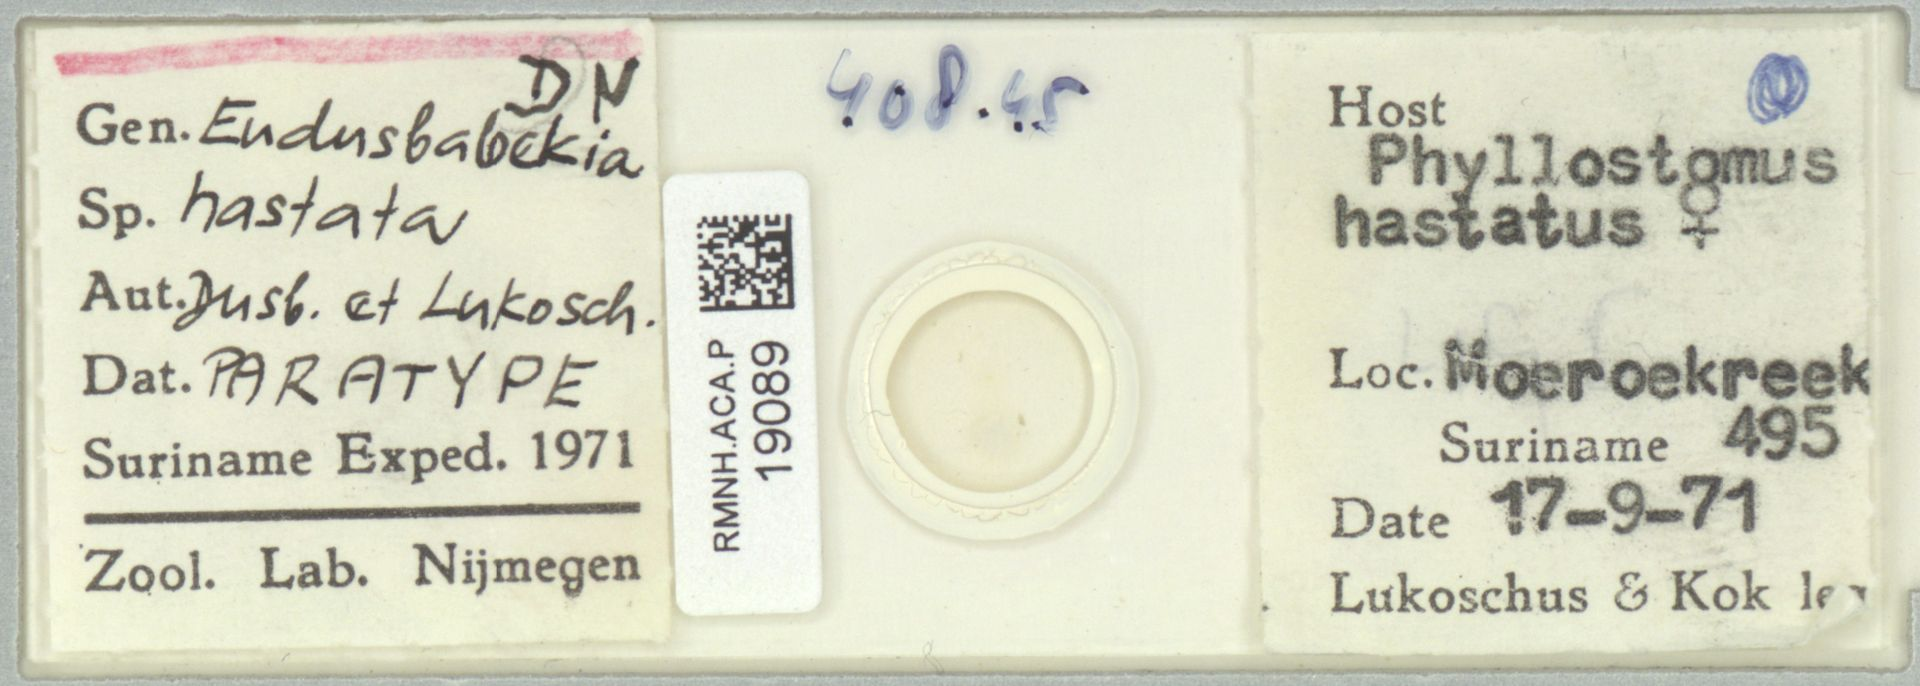 RMNH.ACA.P.19089 | Eudusbabekia hastata